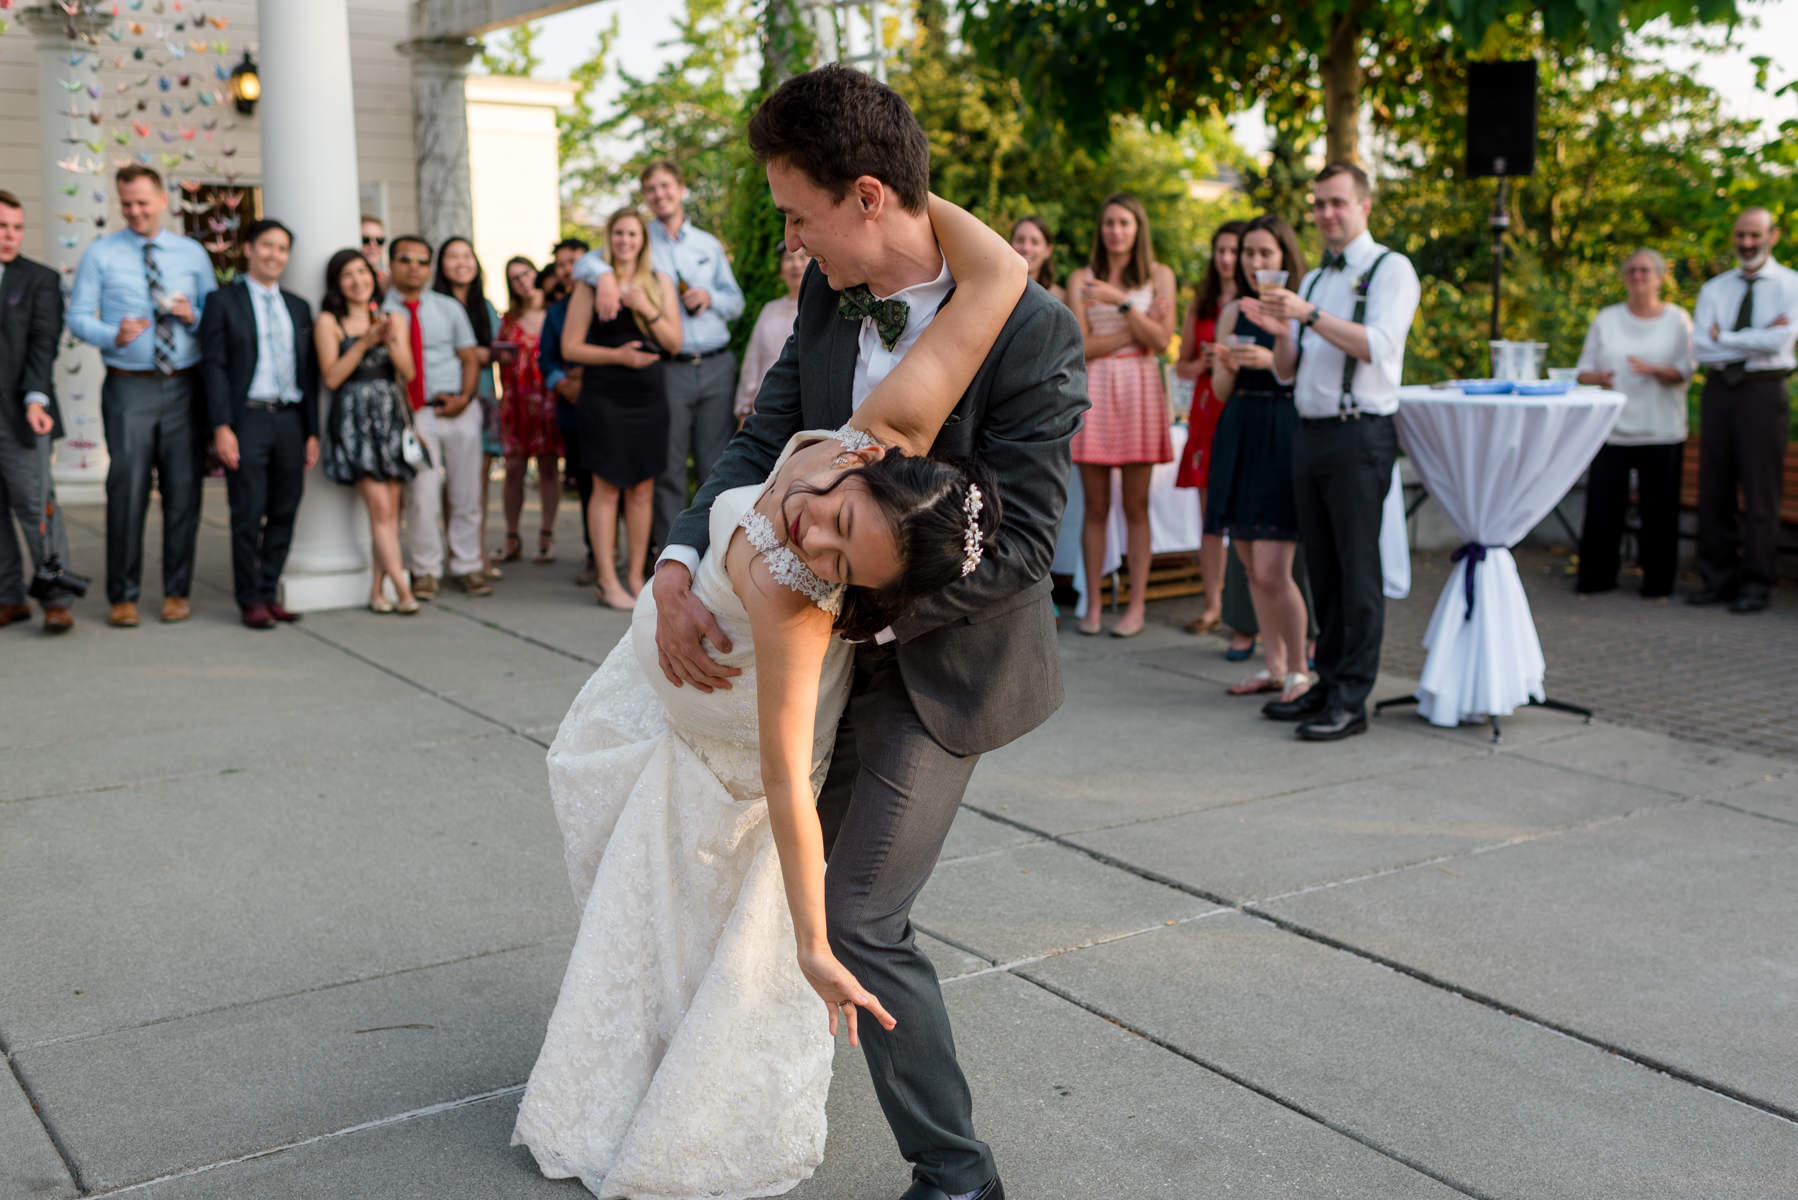 Andrew Tat - Documentary Wedding Photography - Heritage Hall - Kirkland, Washington - Grace & James - 76.JPG